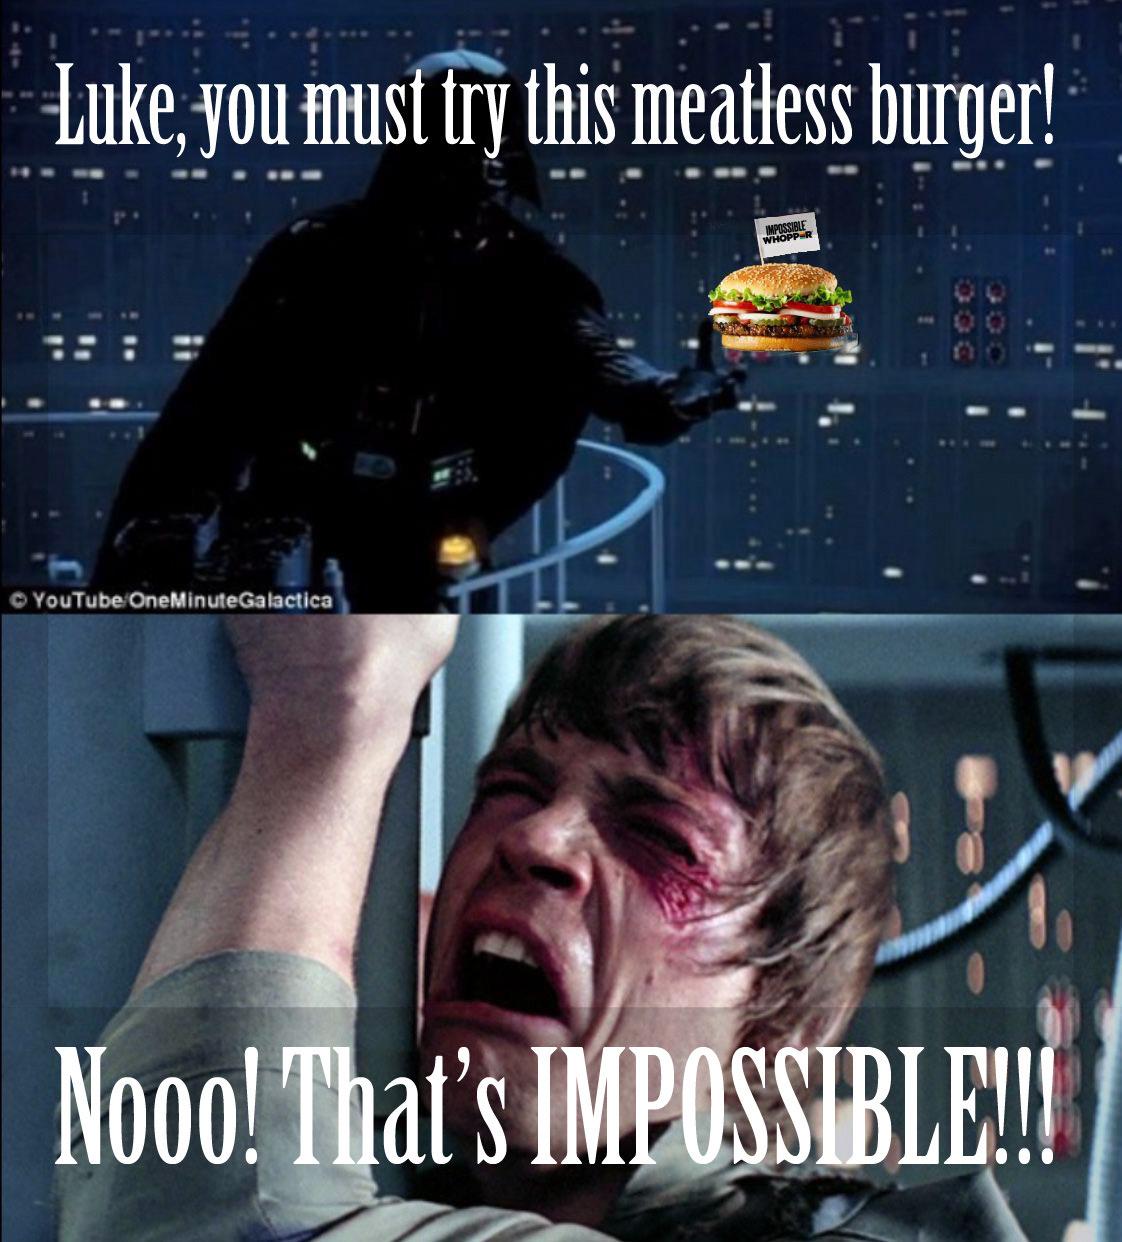 Luke hate whoppers - meme